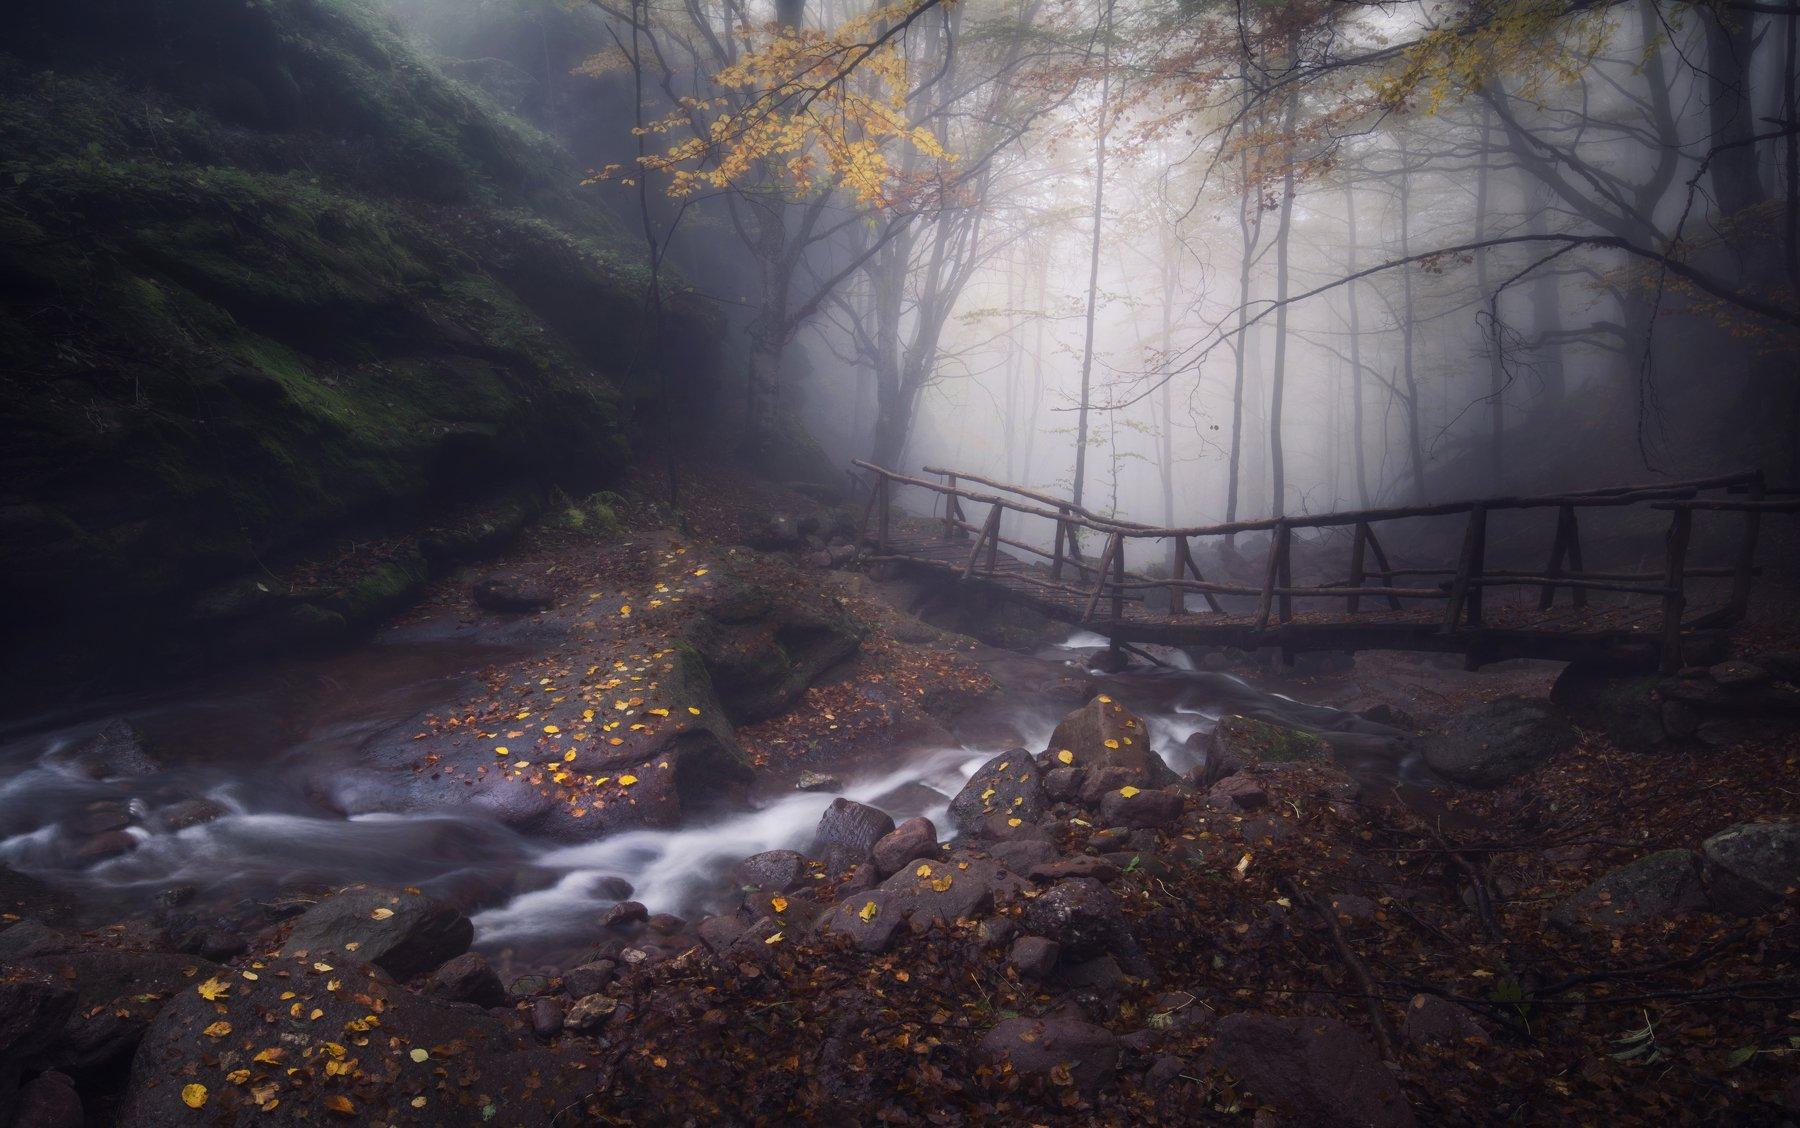 пейзаж, природа, landscape, nature, waterfalls, autumn, Genadi Dochev